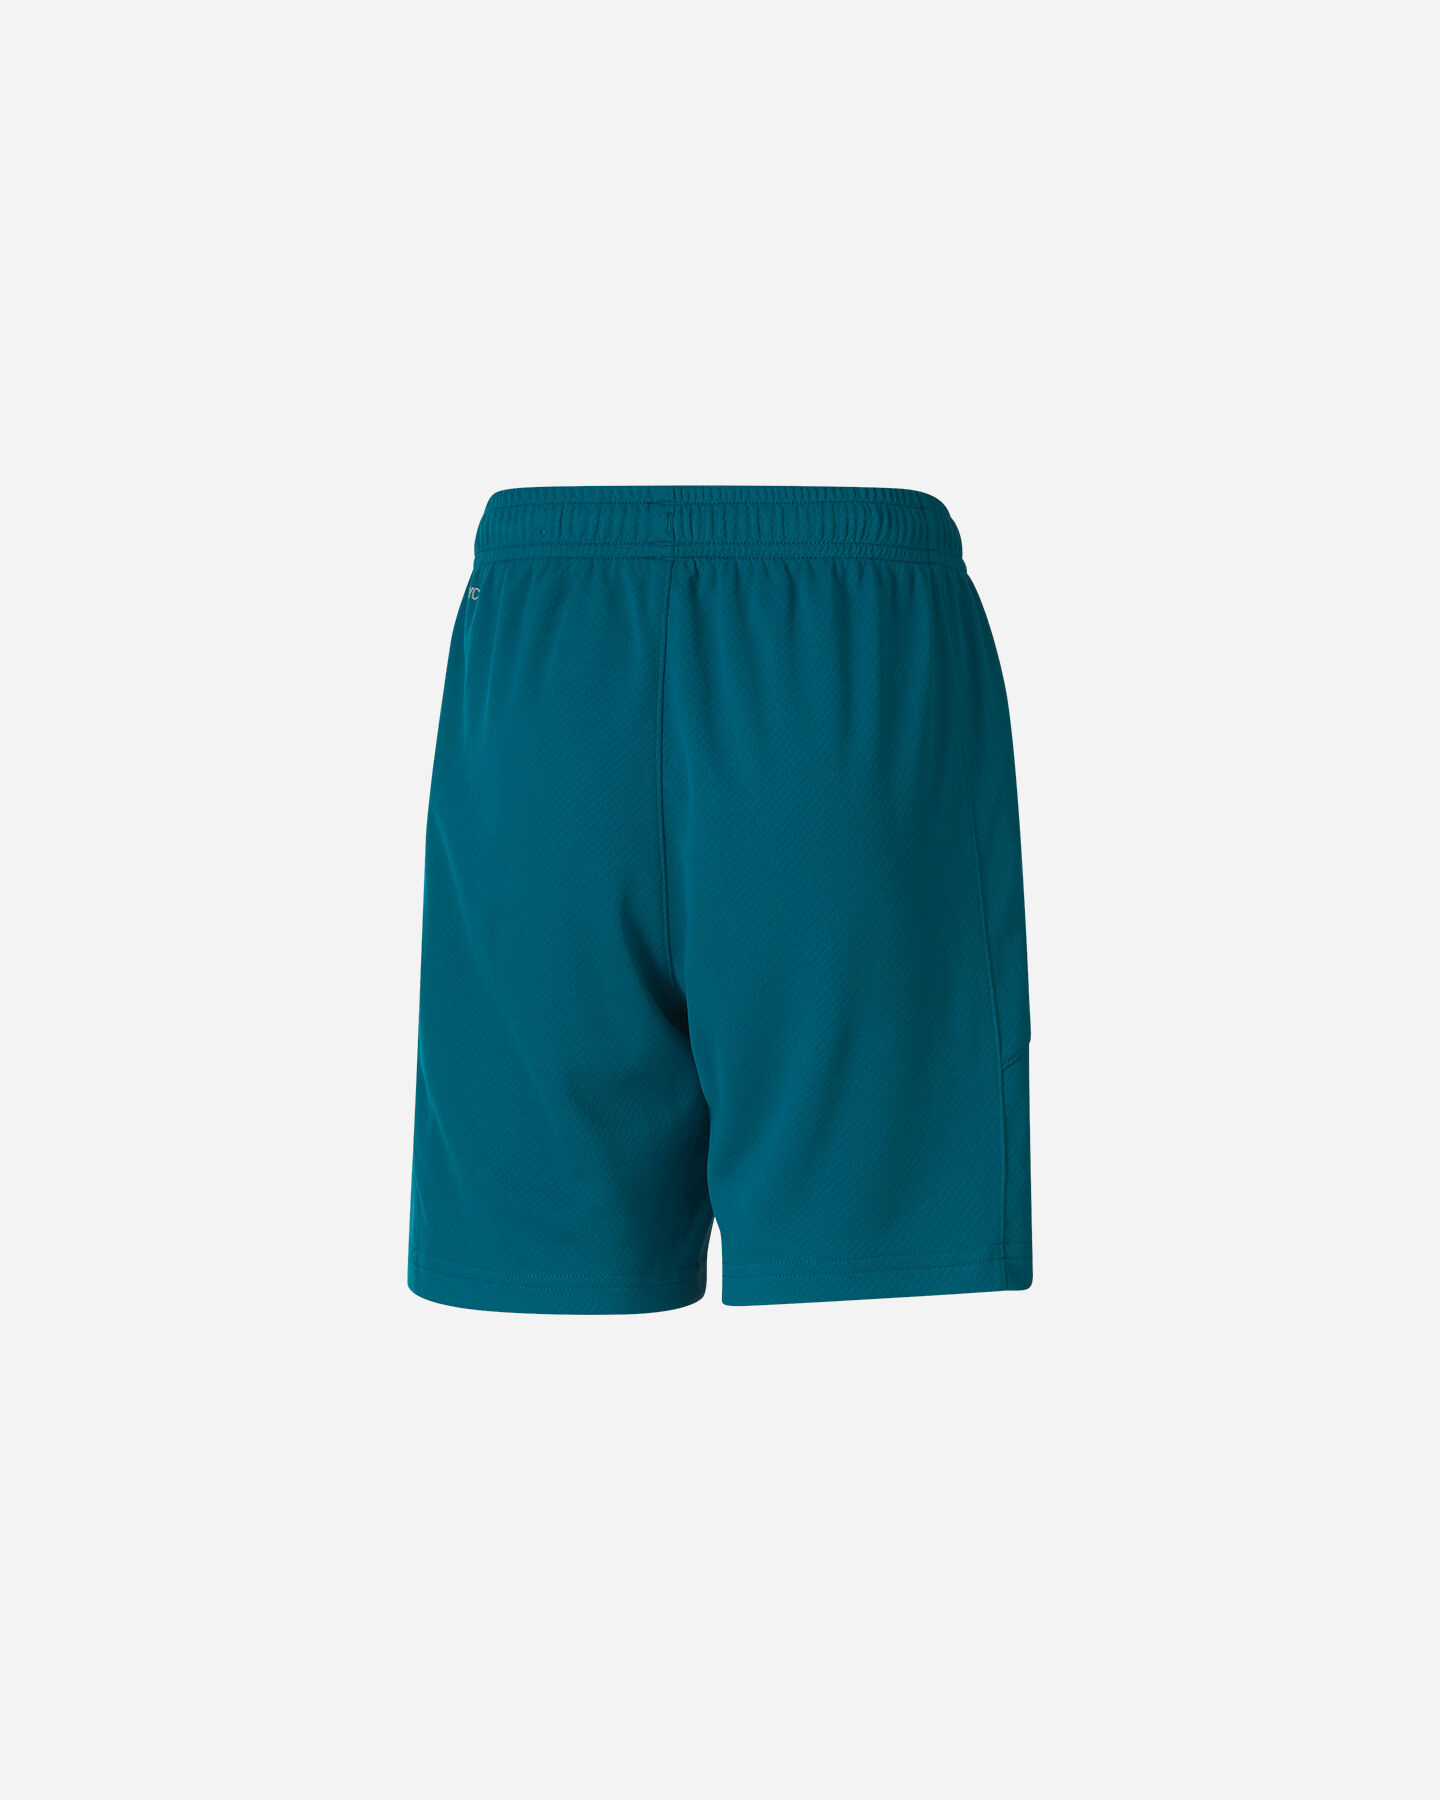 Pantaloncini calcio PUMA MILAN THIRD 20-21 JR S5235795 scatto 1